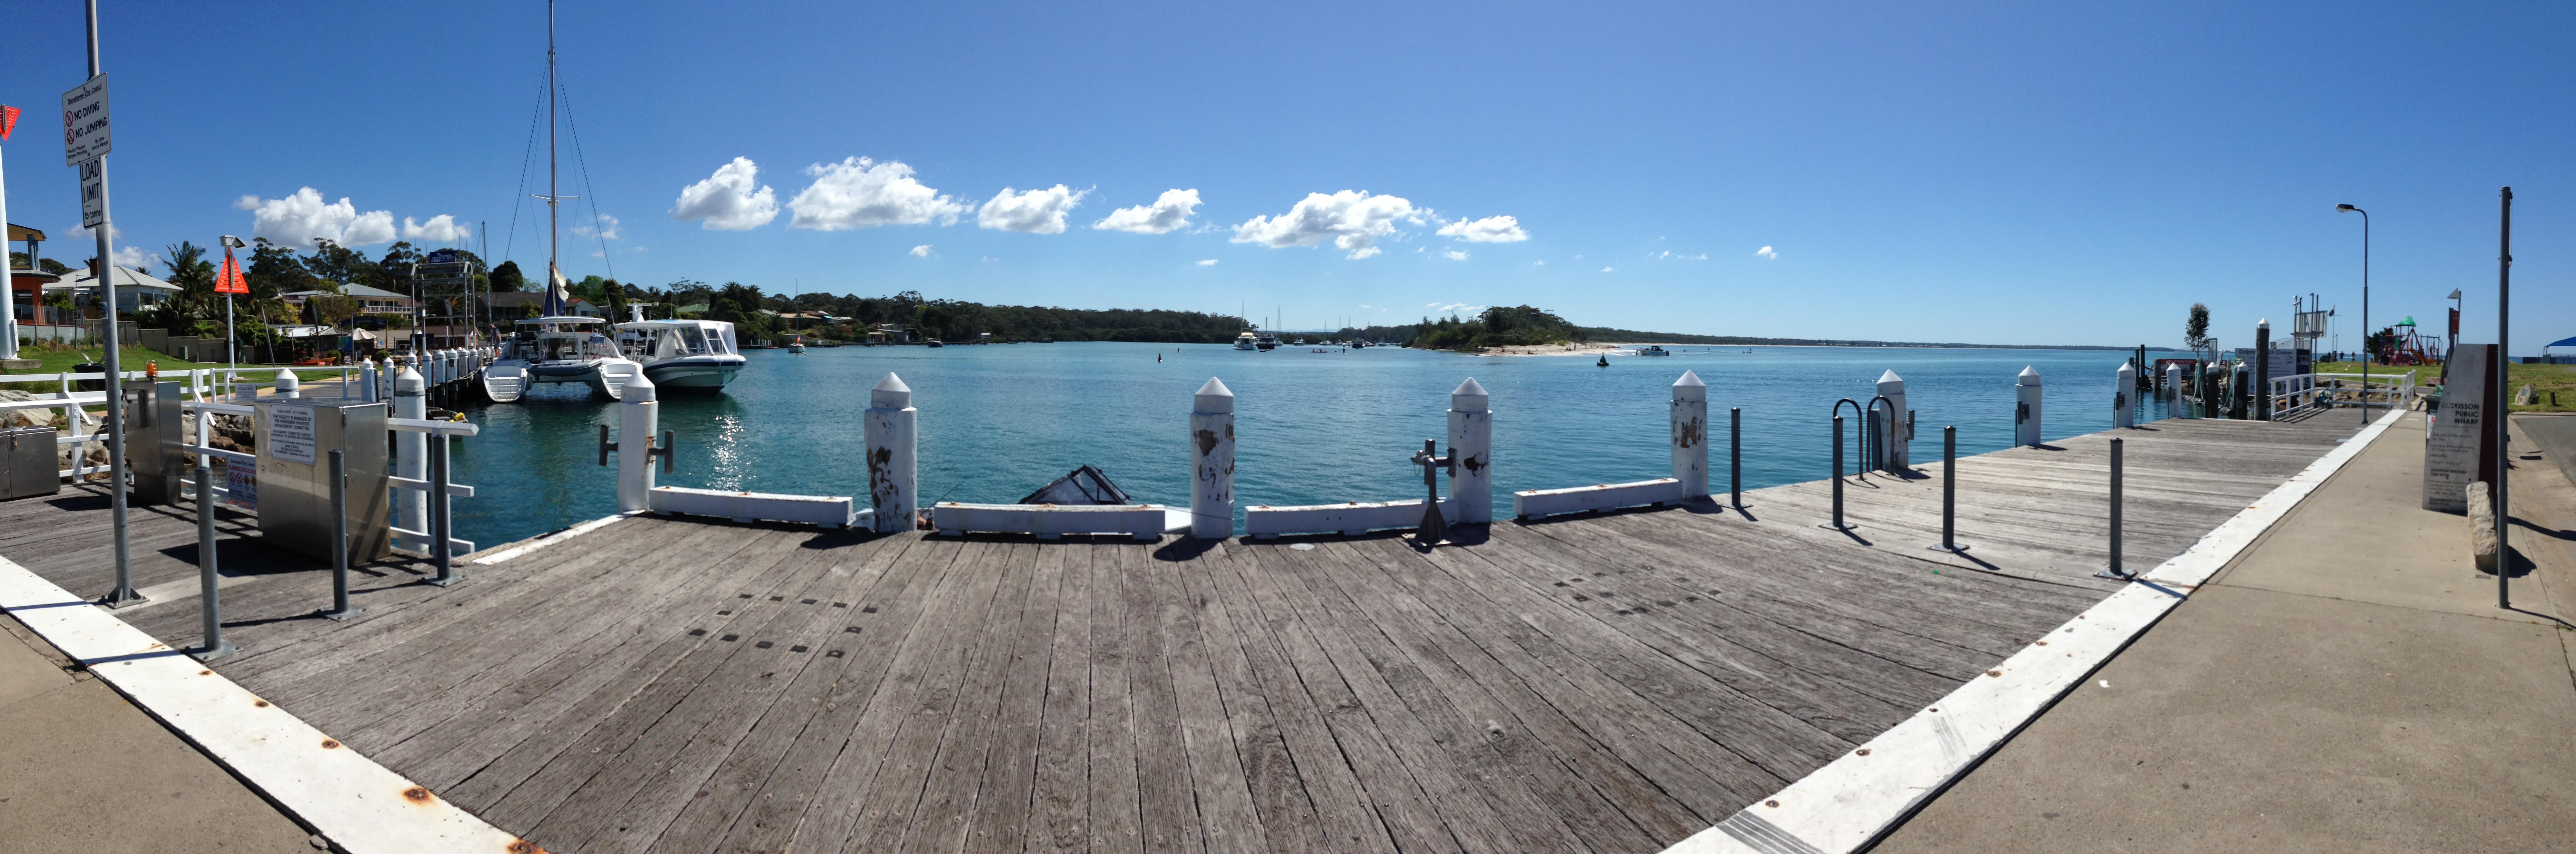 Huskisson Wharf